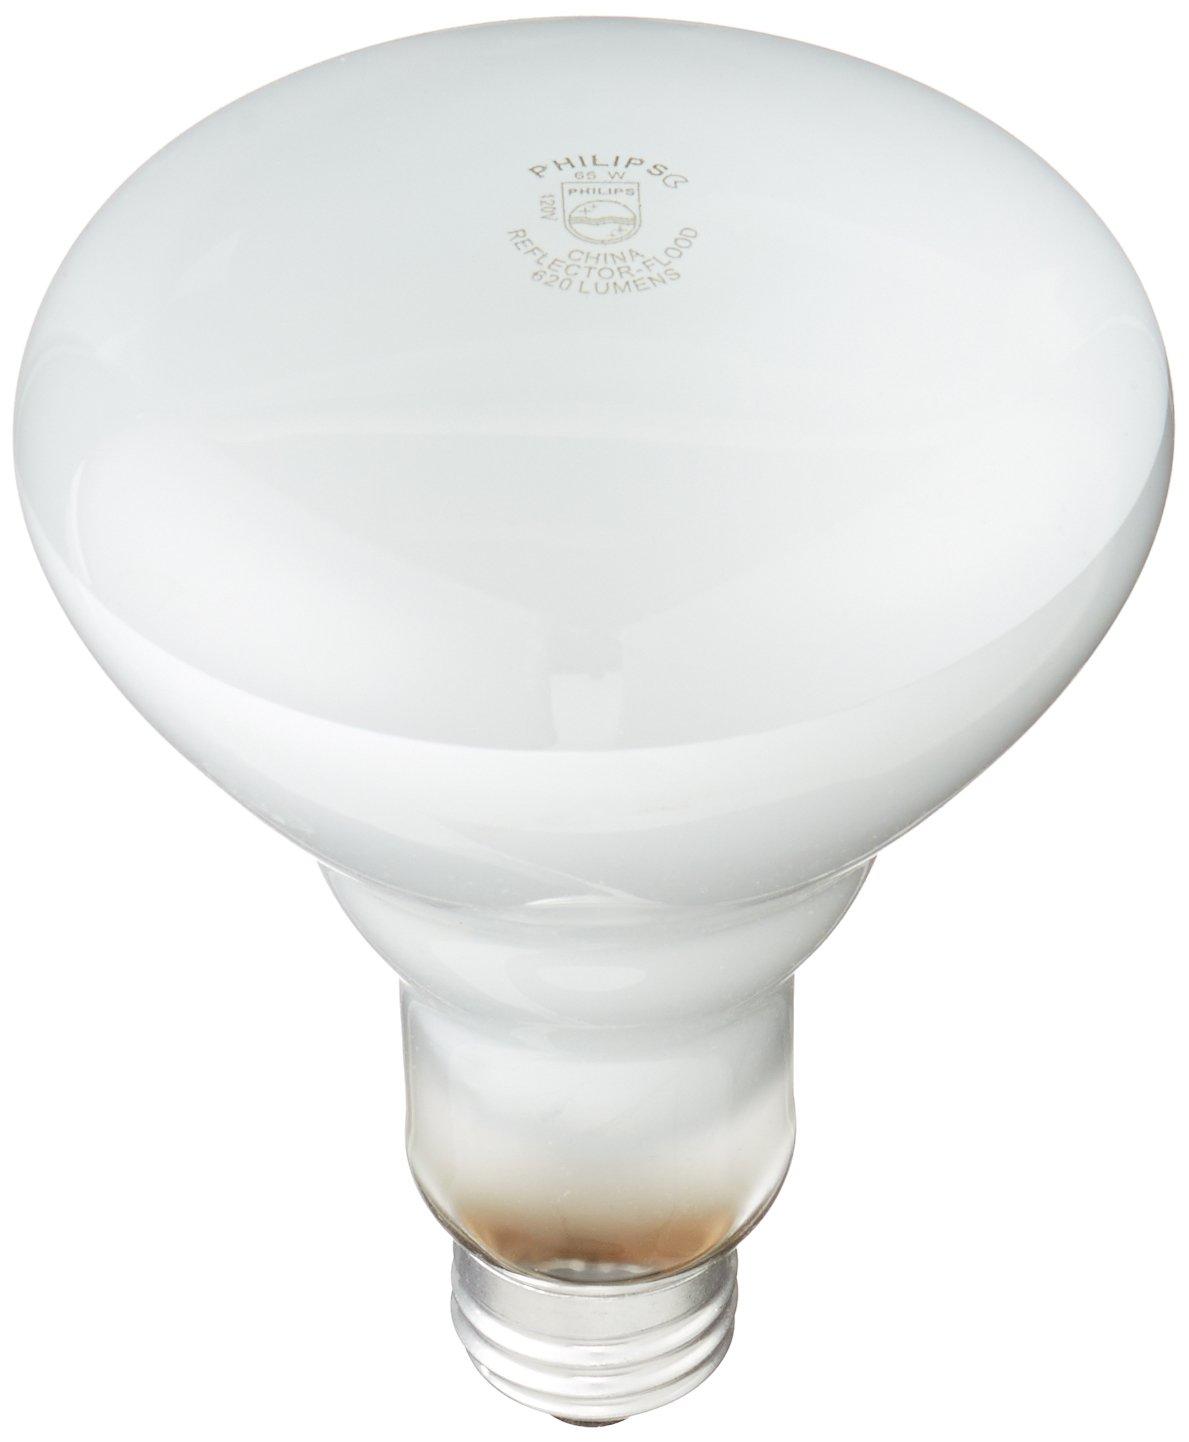 Philips 248872 Soft White 65 Watt BR30 Indoor Flood Light Bulb, 12 Pack    Incandescent Bulbs   Amazon.com